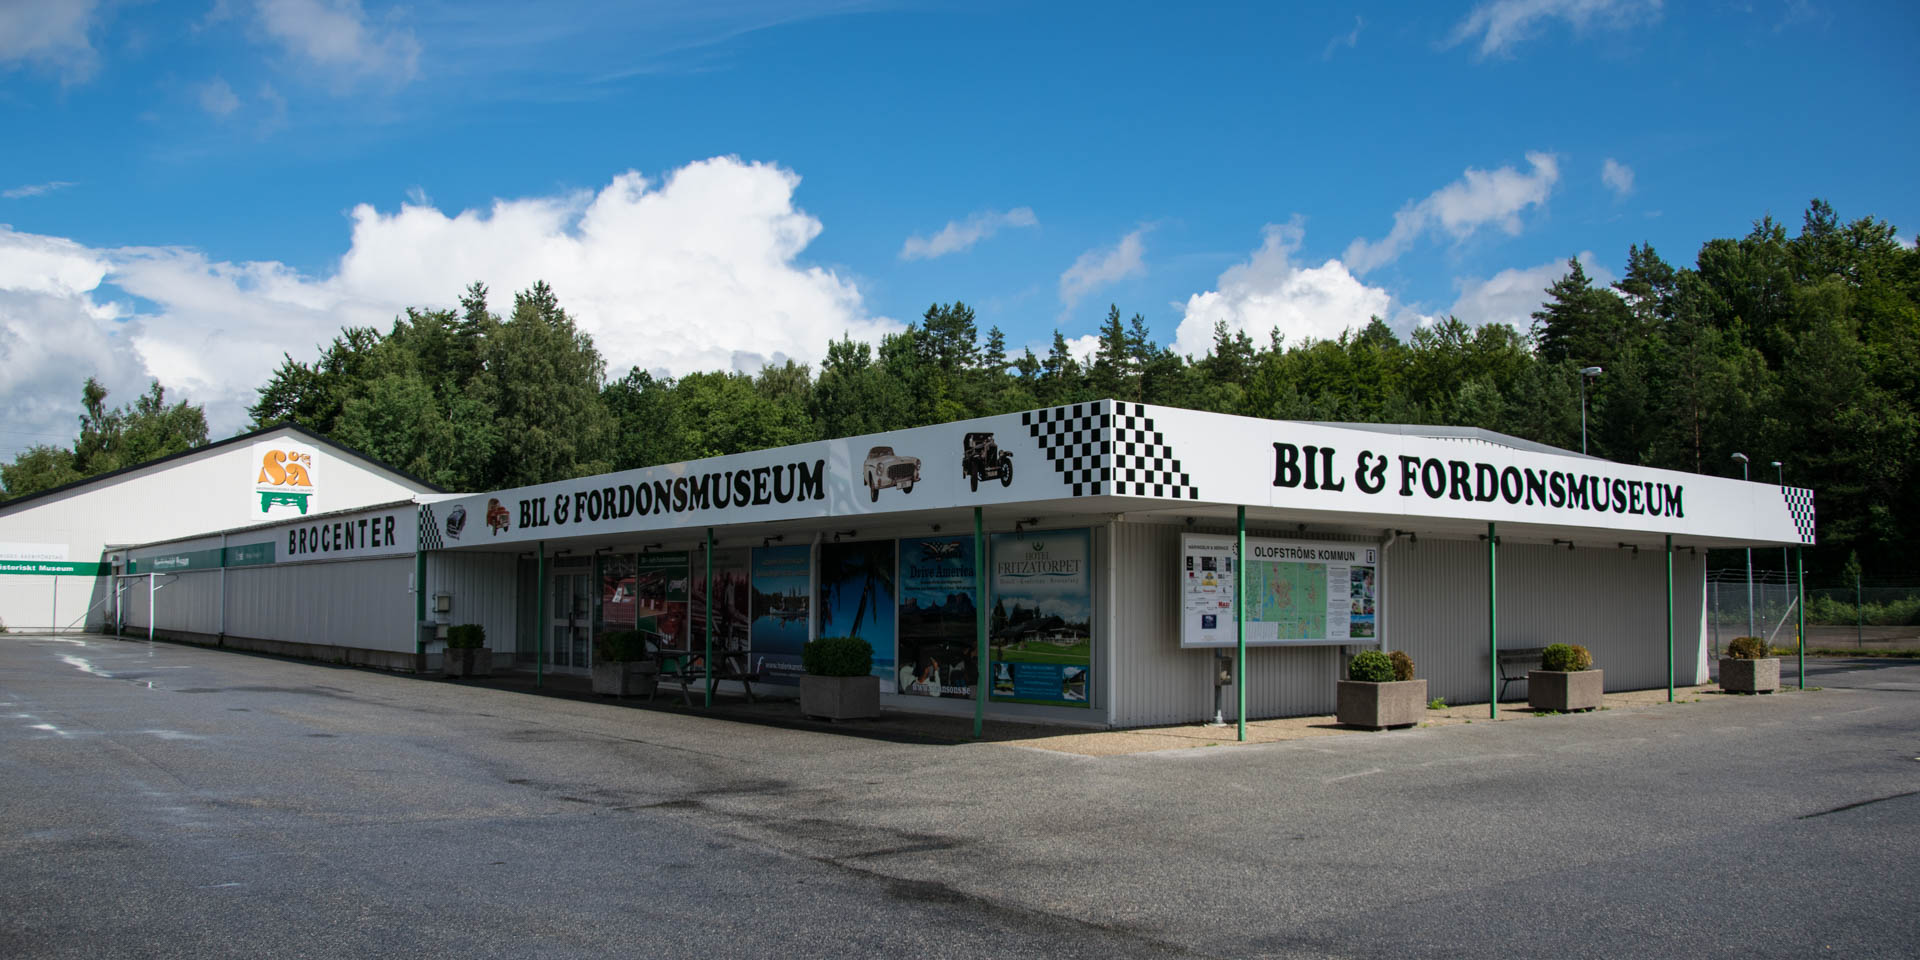 Brocenter Bil- & Fordonsmuseum 2016